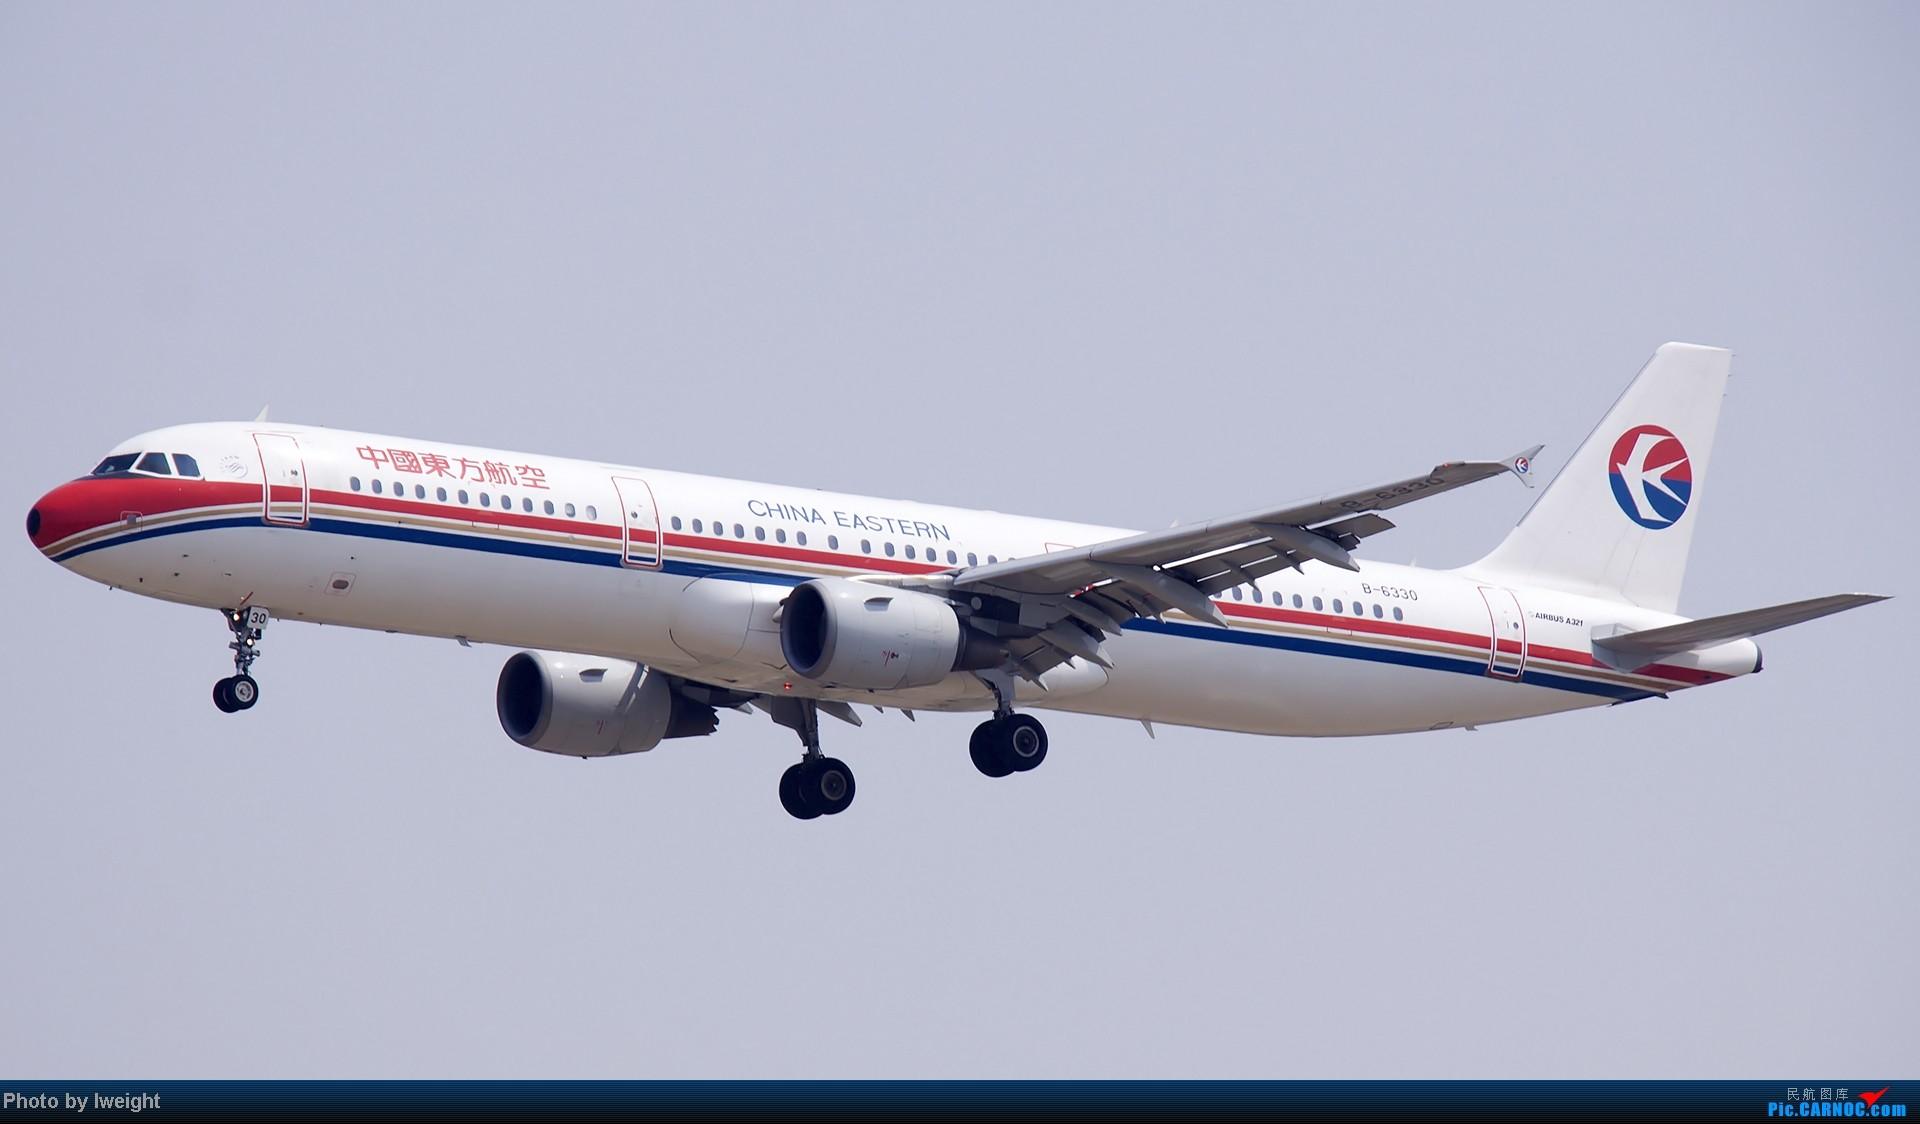 Re:[原创]错过了卡航的巴塞罗那号,只有这些大路货了,泪奔啊 AIRBUS A320-200 B-6330 中国北京首都机场